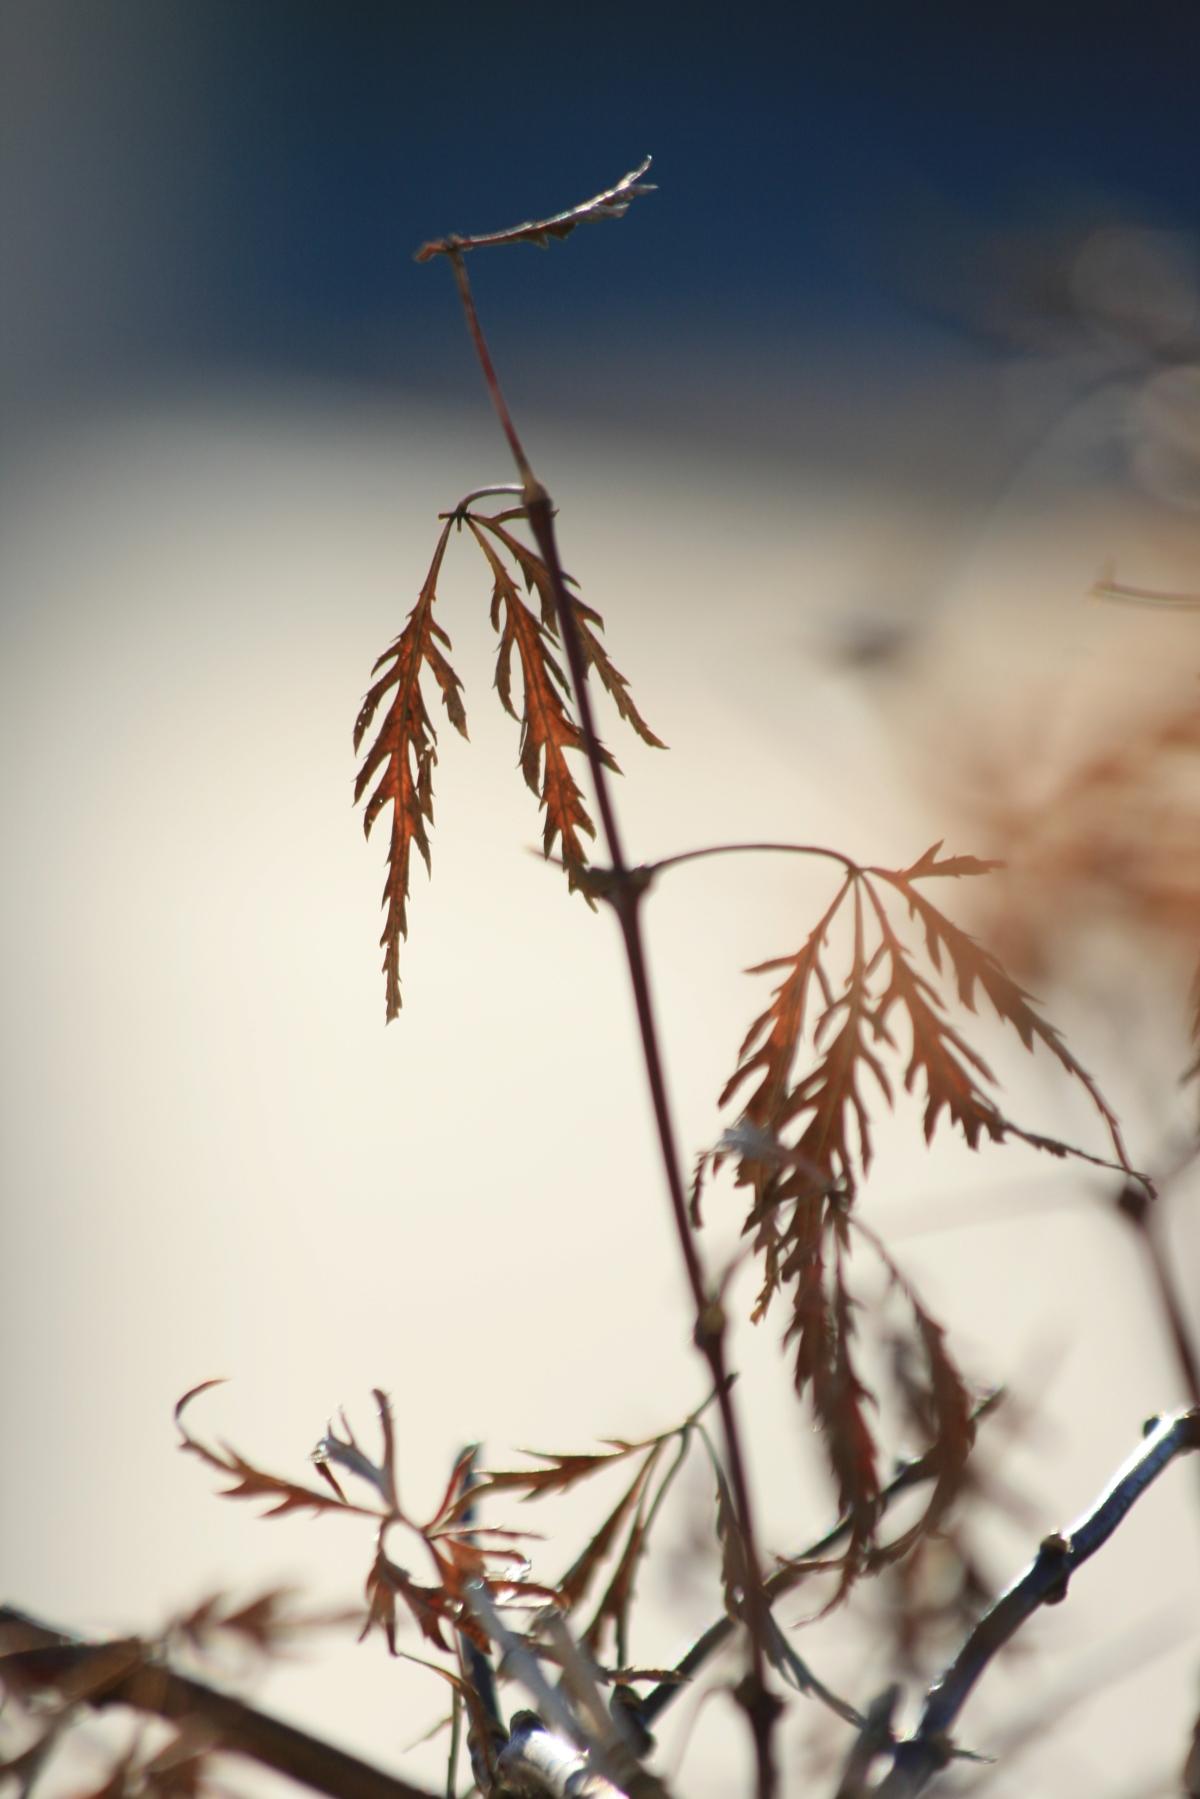 Dead Japanese Maple Leaves